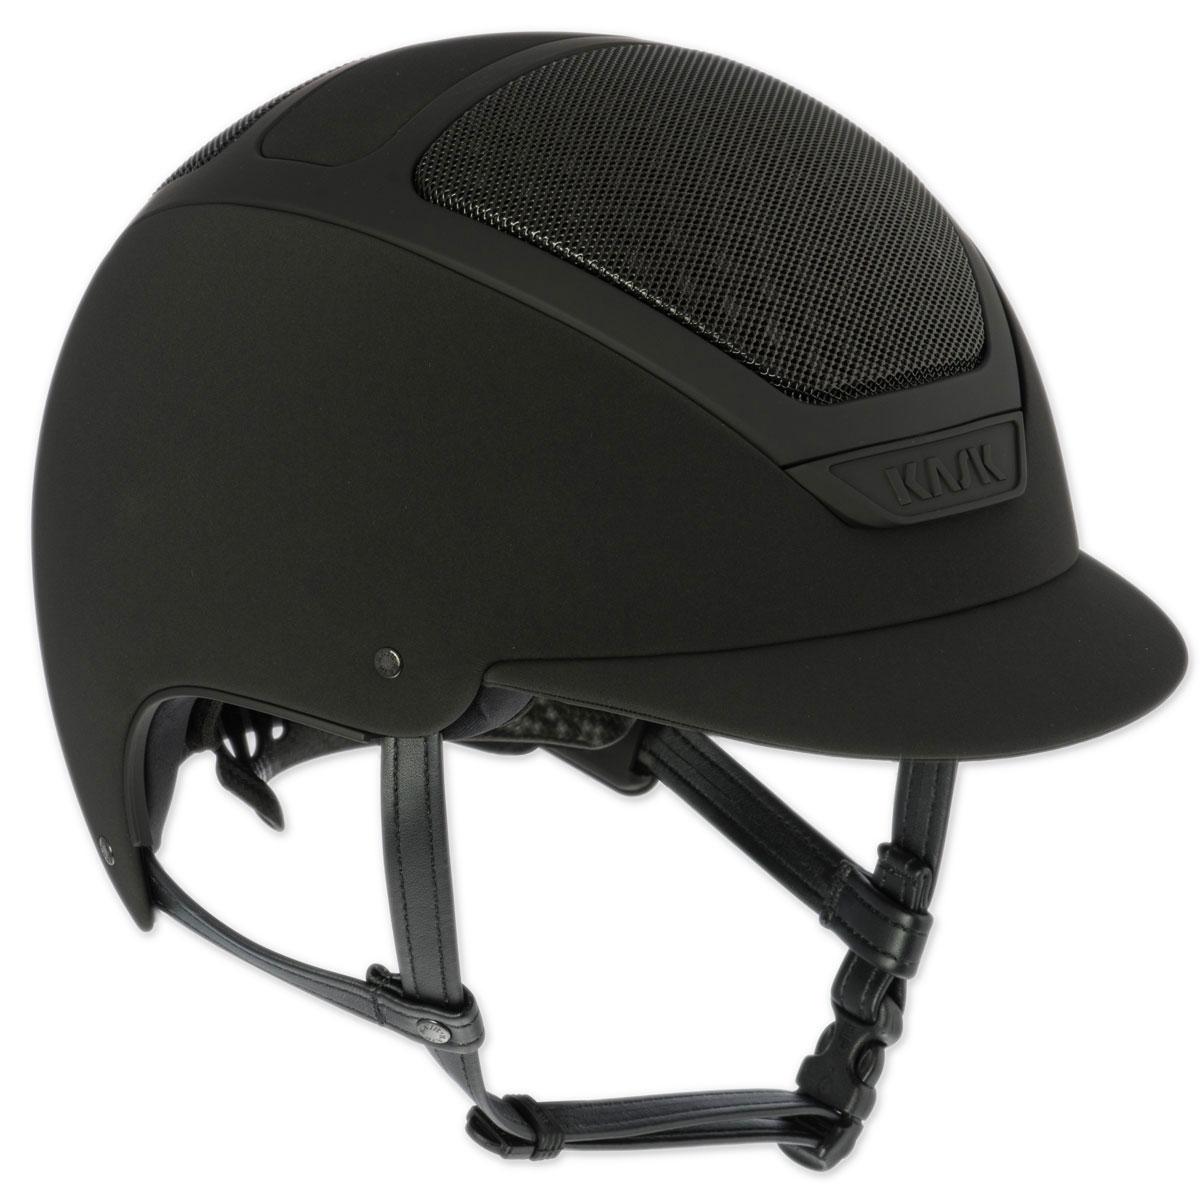 KASK Dogma Light Helmet